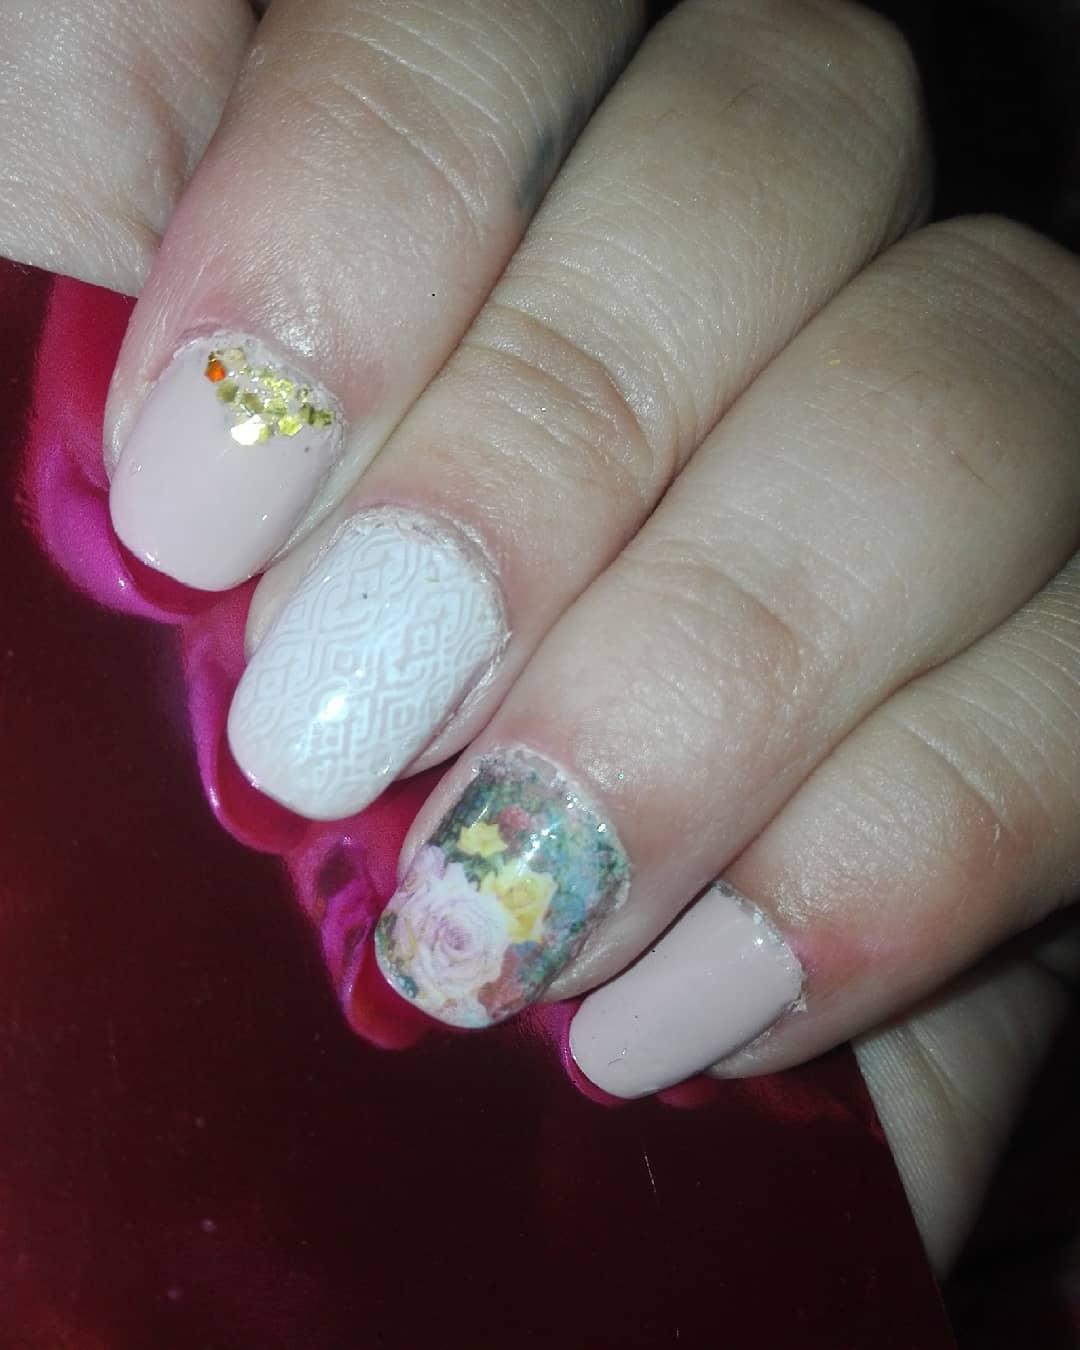 #nailsart # decoração de unhas # unhas decoradas #nascinas naturais #capa de unhas #rospalo ...